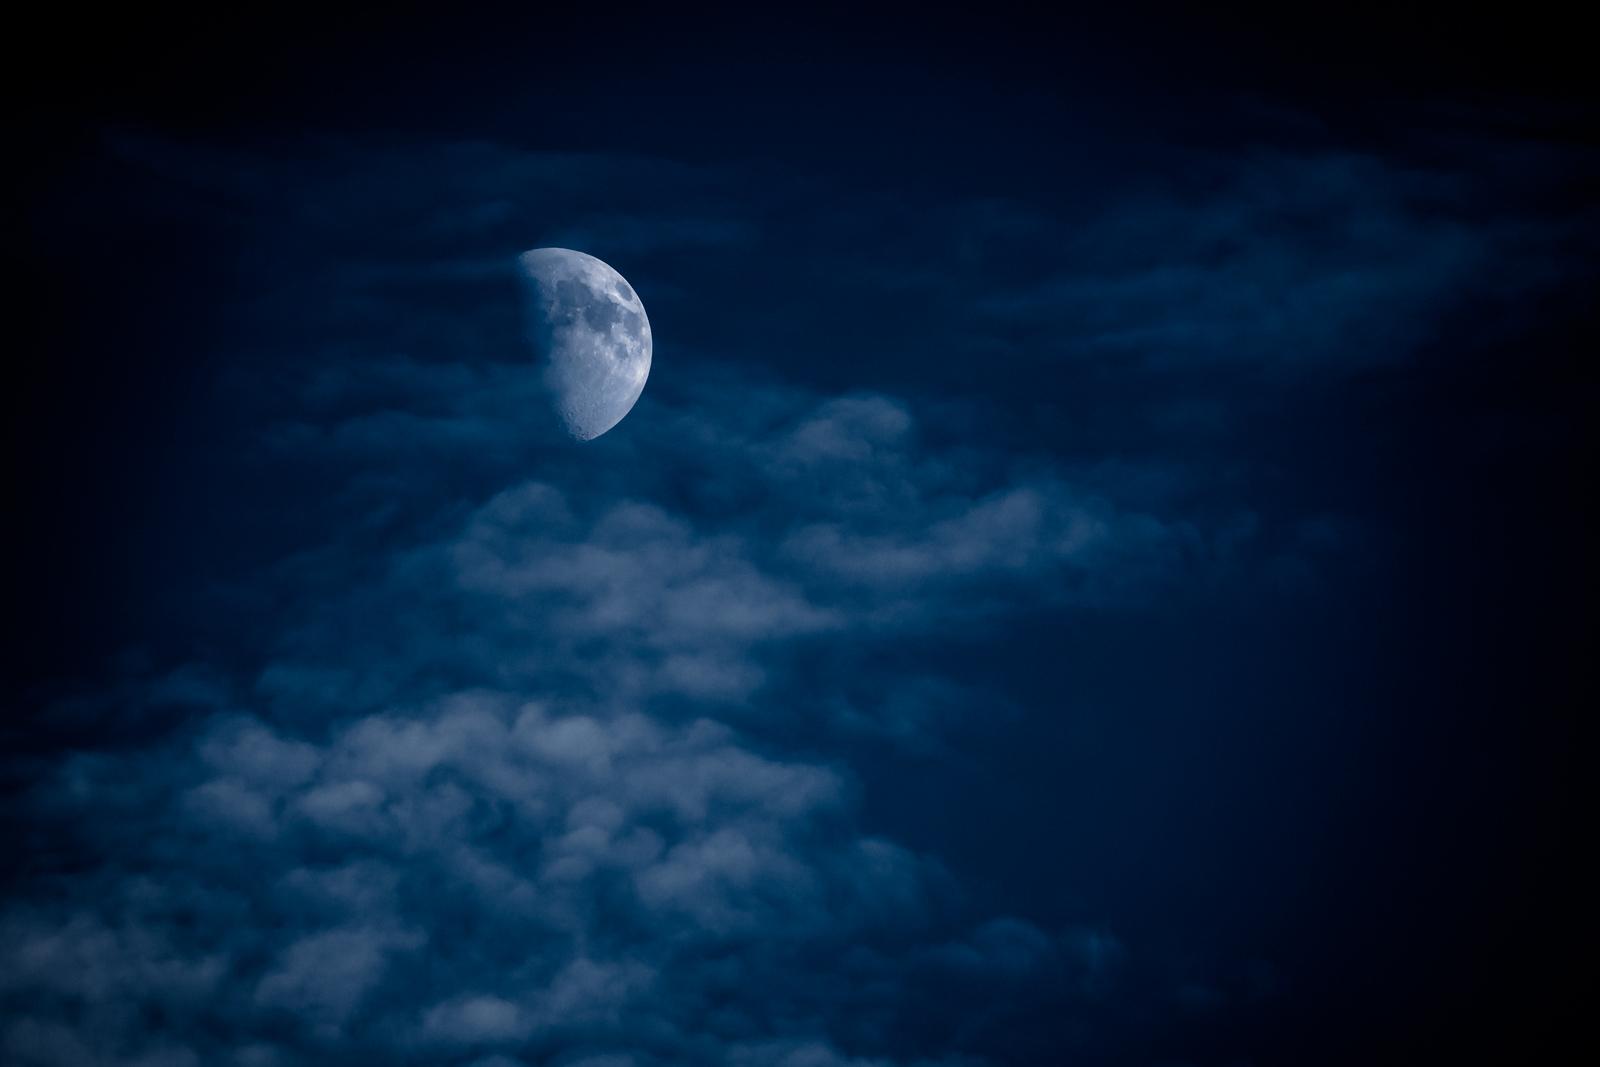 02 Blue moon - 74x103cm Cicléprint with black frame, passepartout and museum glass